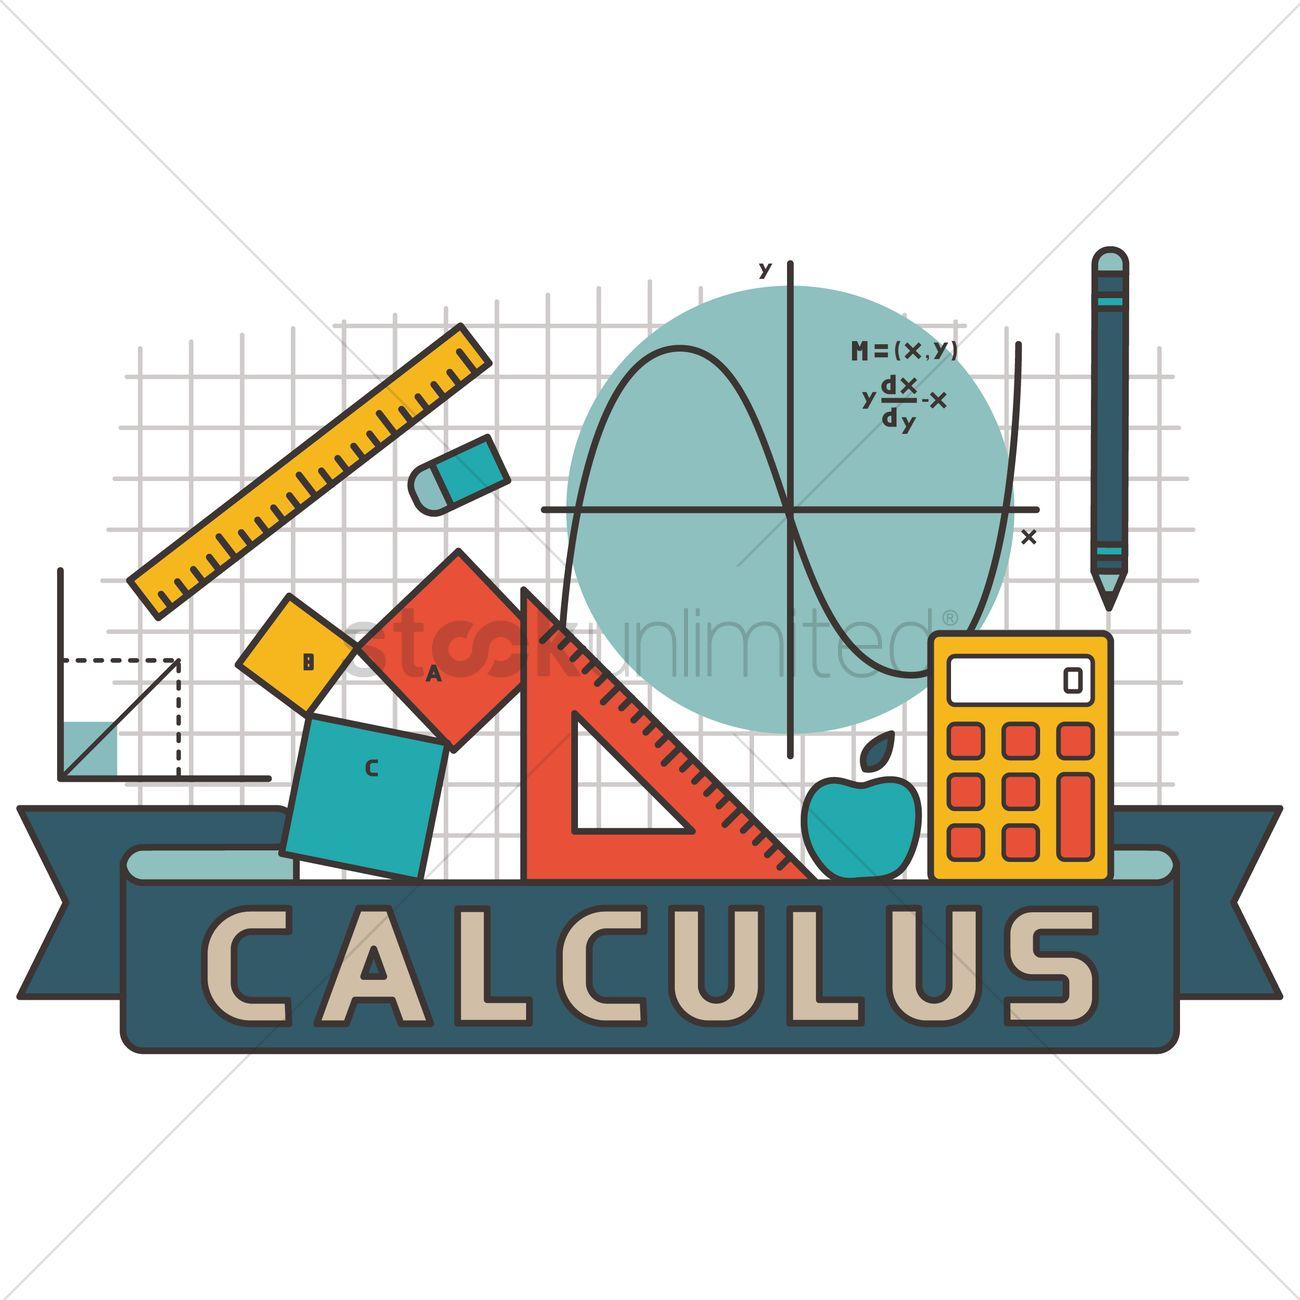 Geometry clipart basic calculus, Geometry basic calculus.